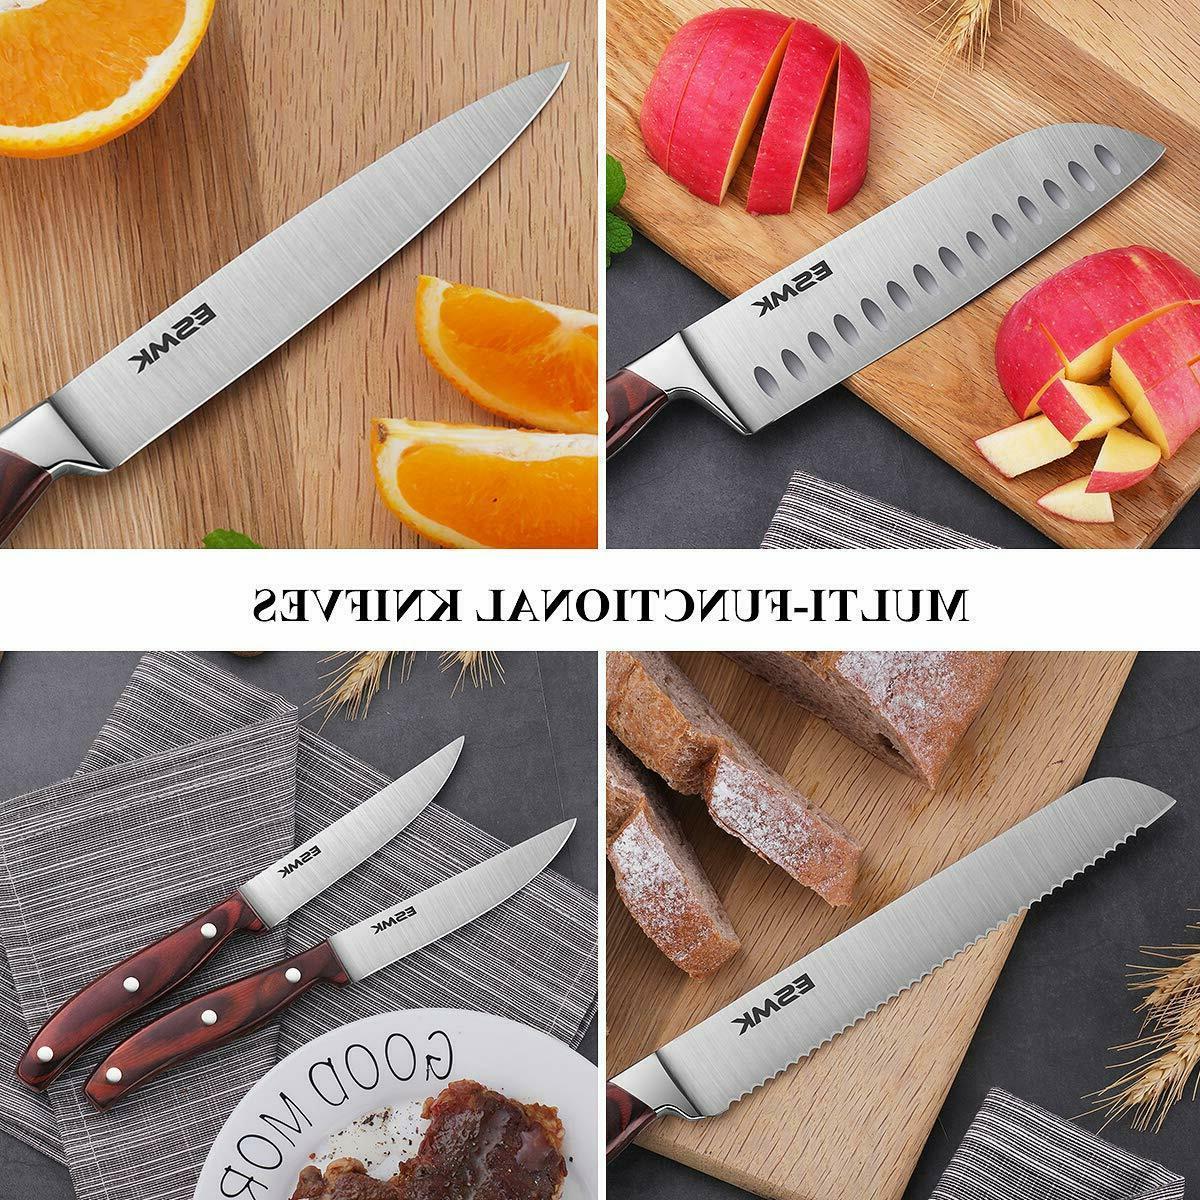 15-Pcs Kitchen Knife Wooden Block Ro